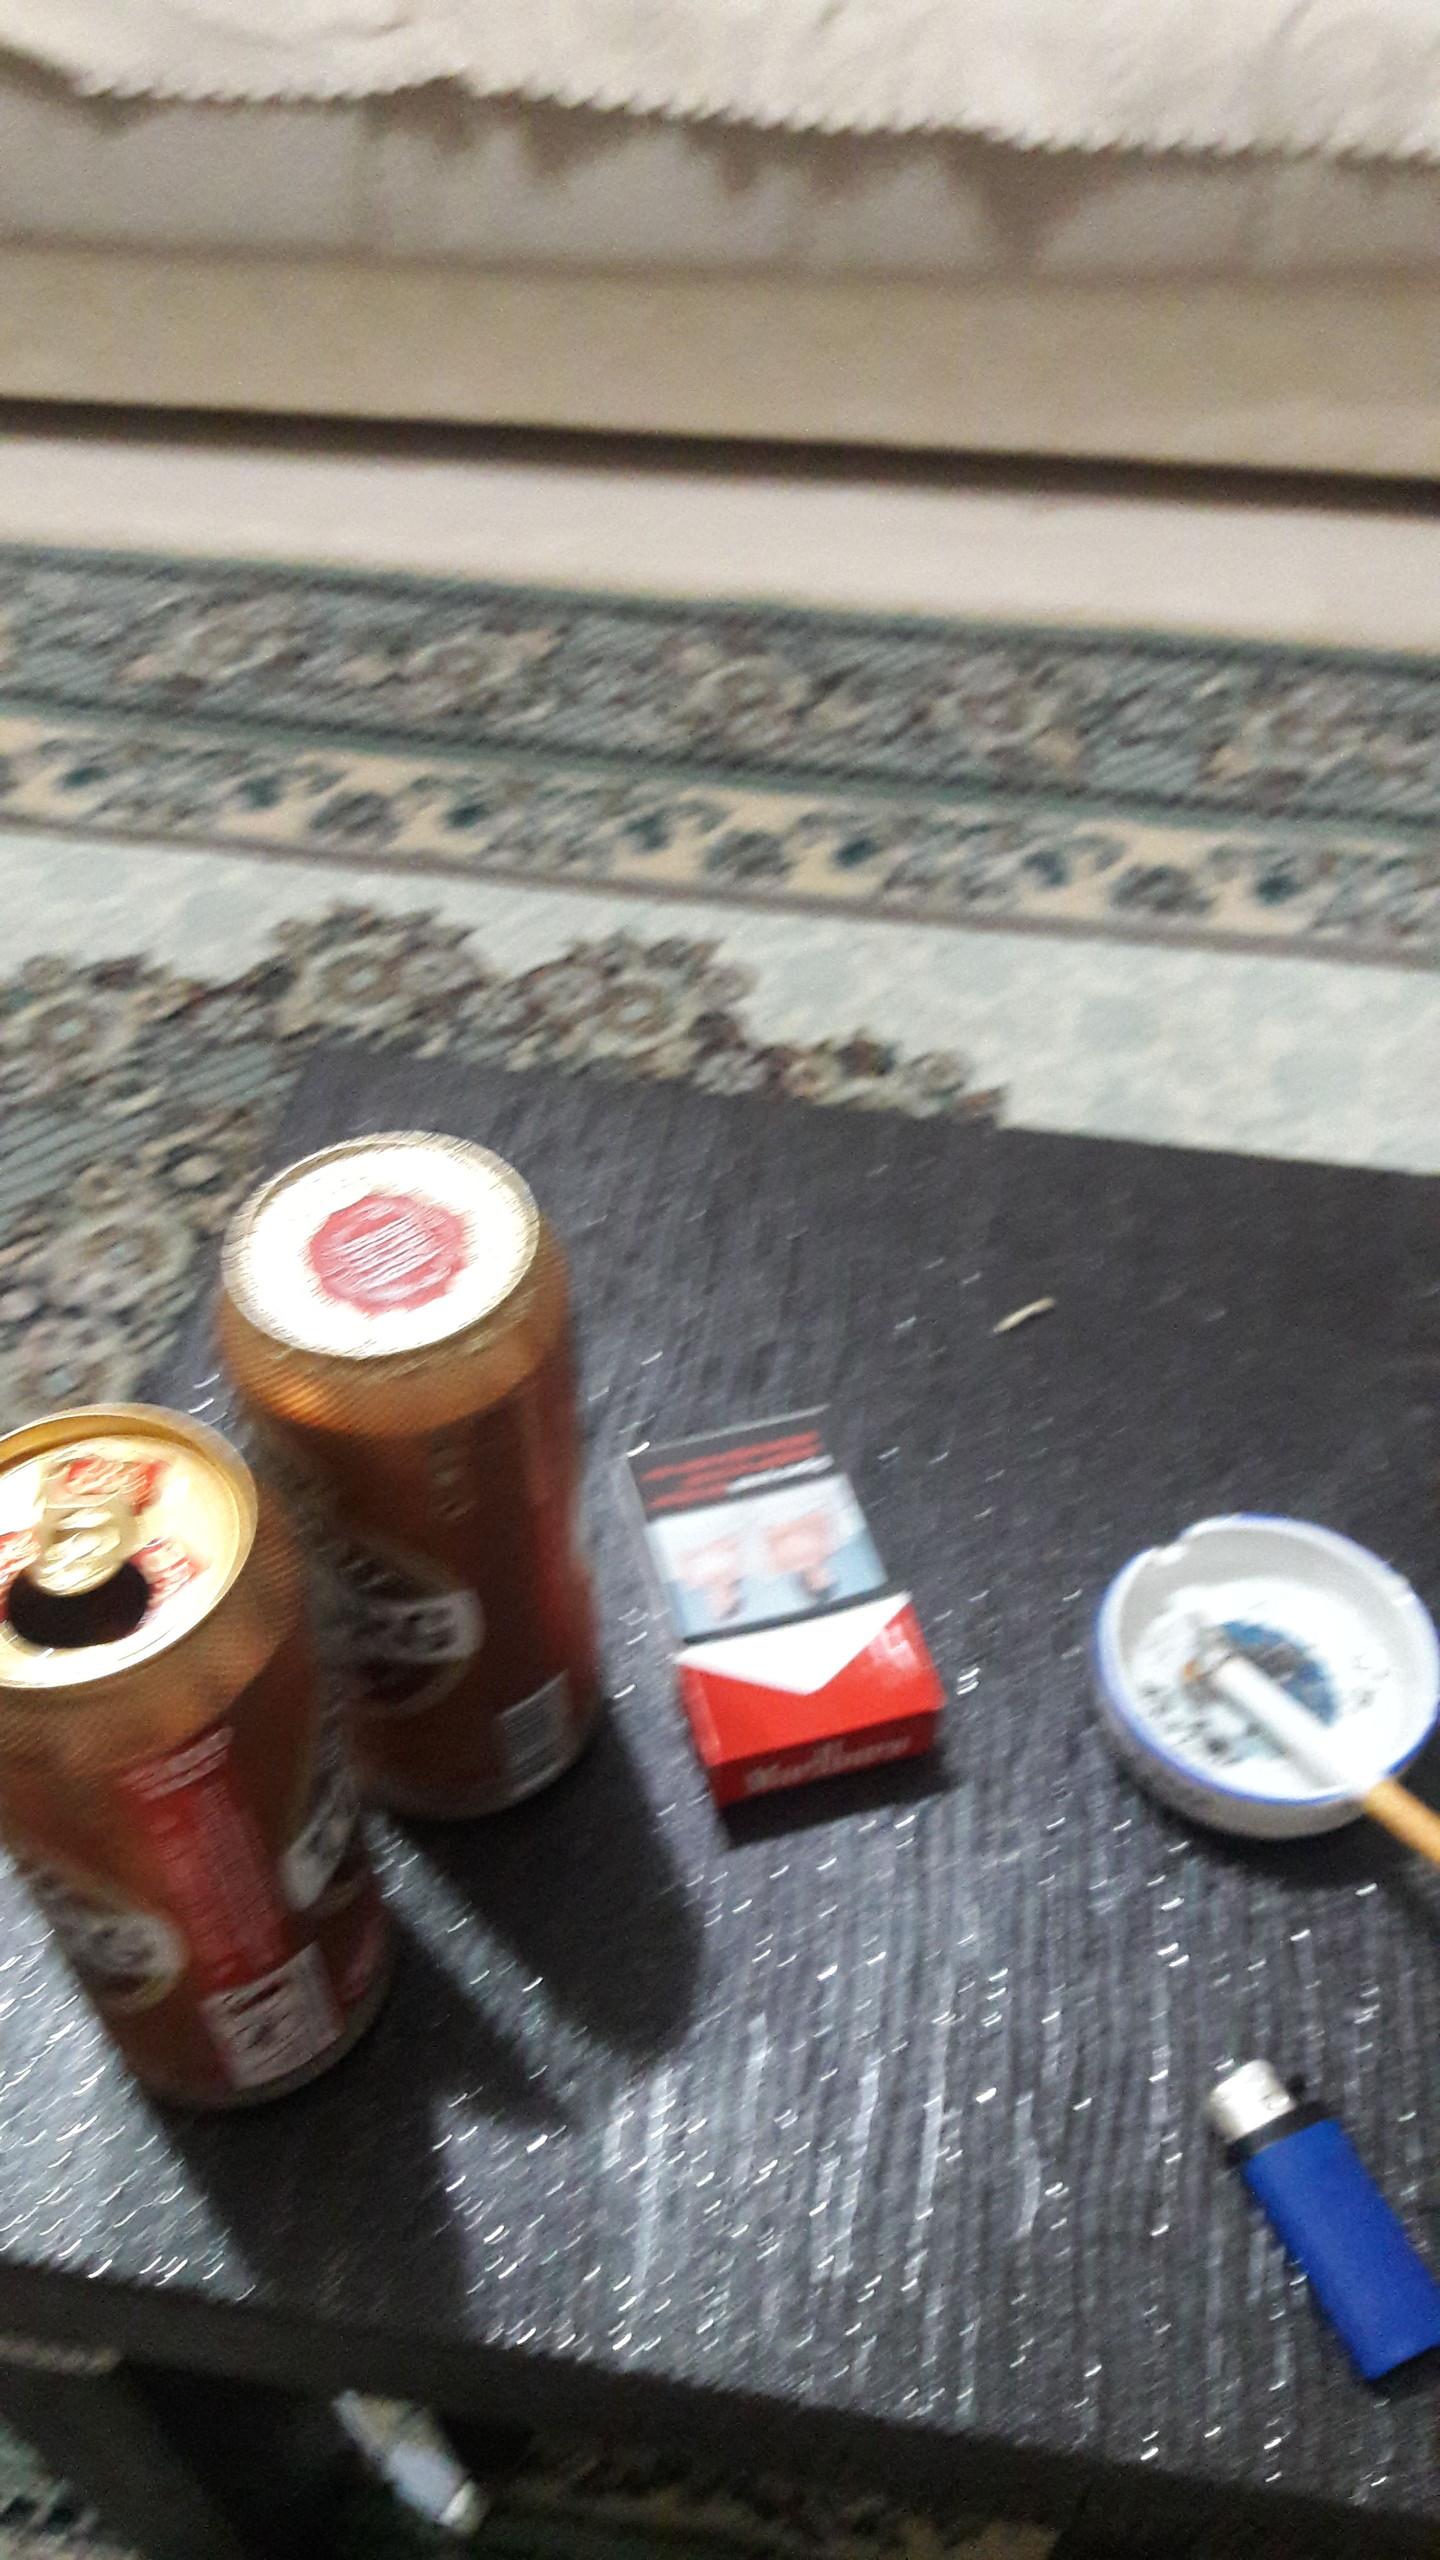 bizde meze masası yok varsa iki bira bi sigara uyarsa bi cigara